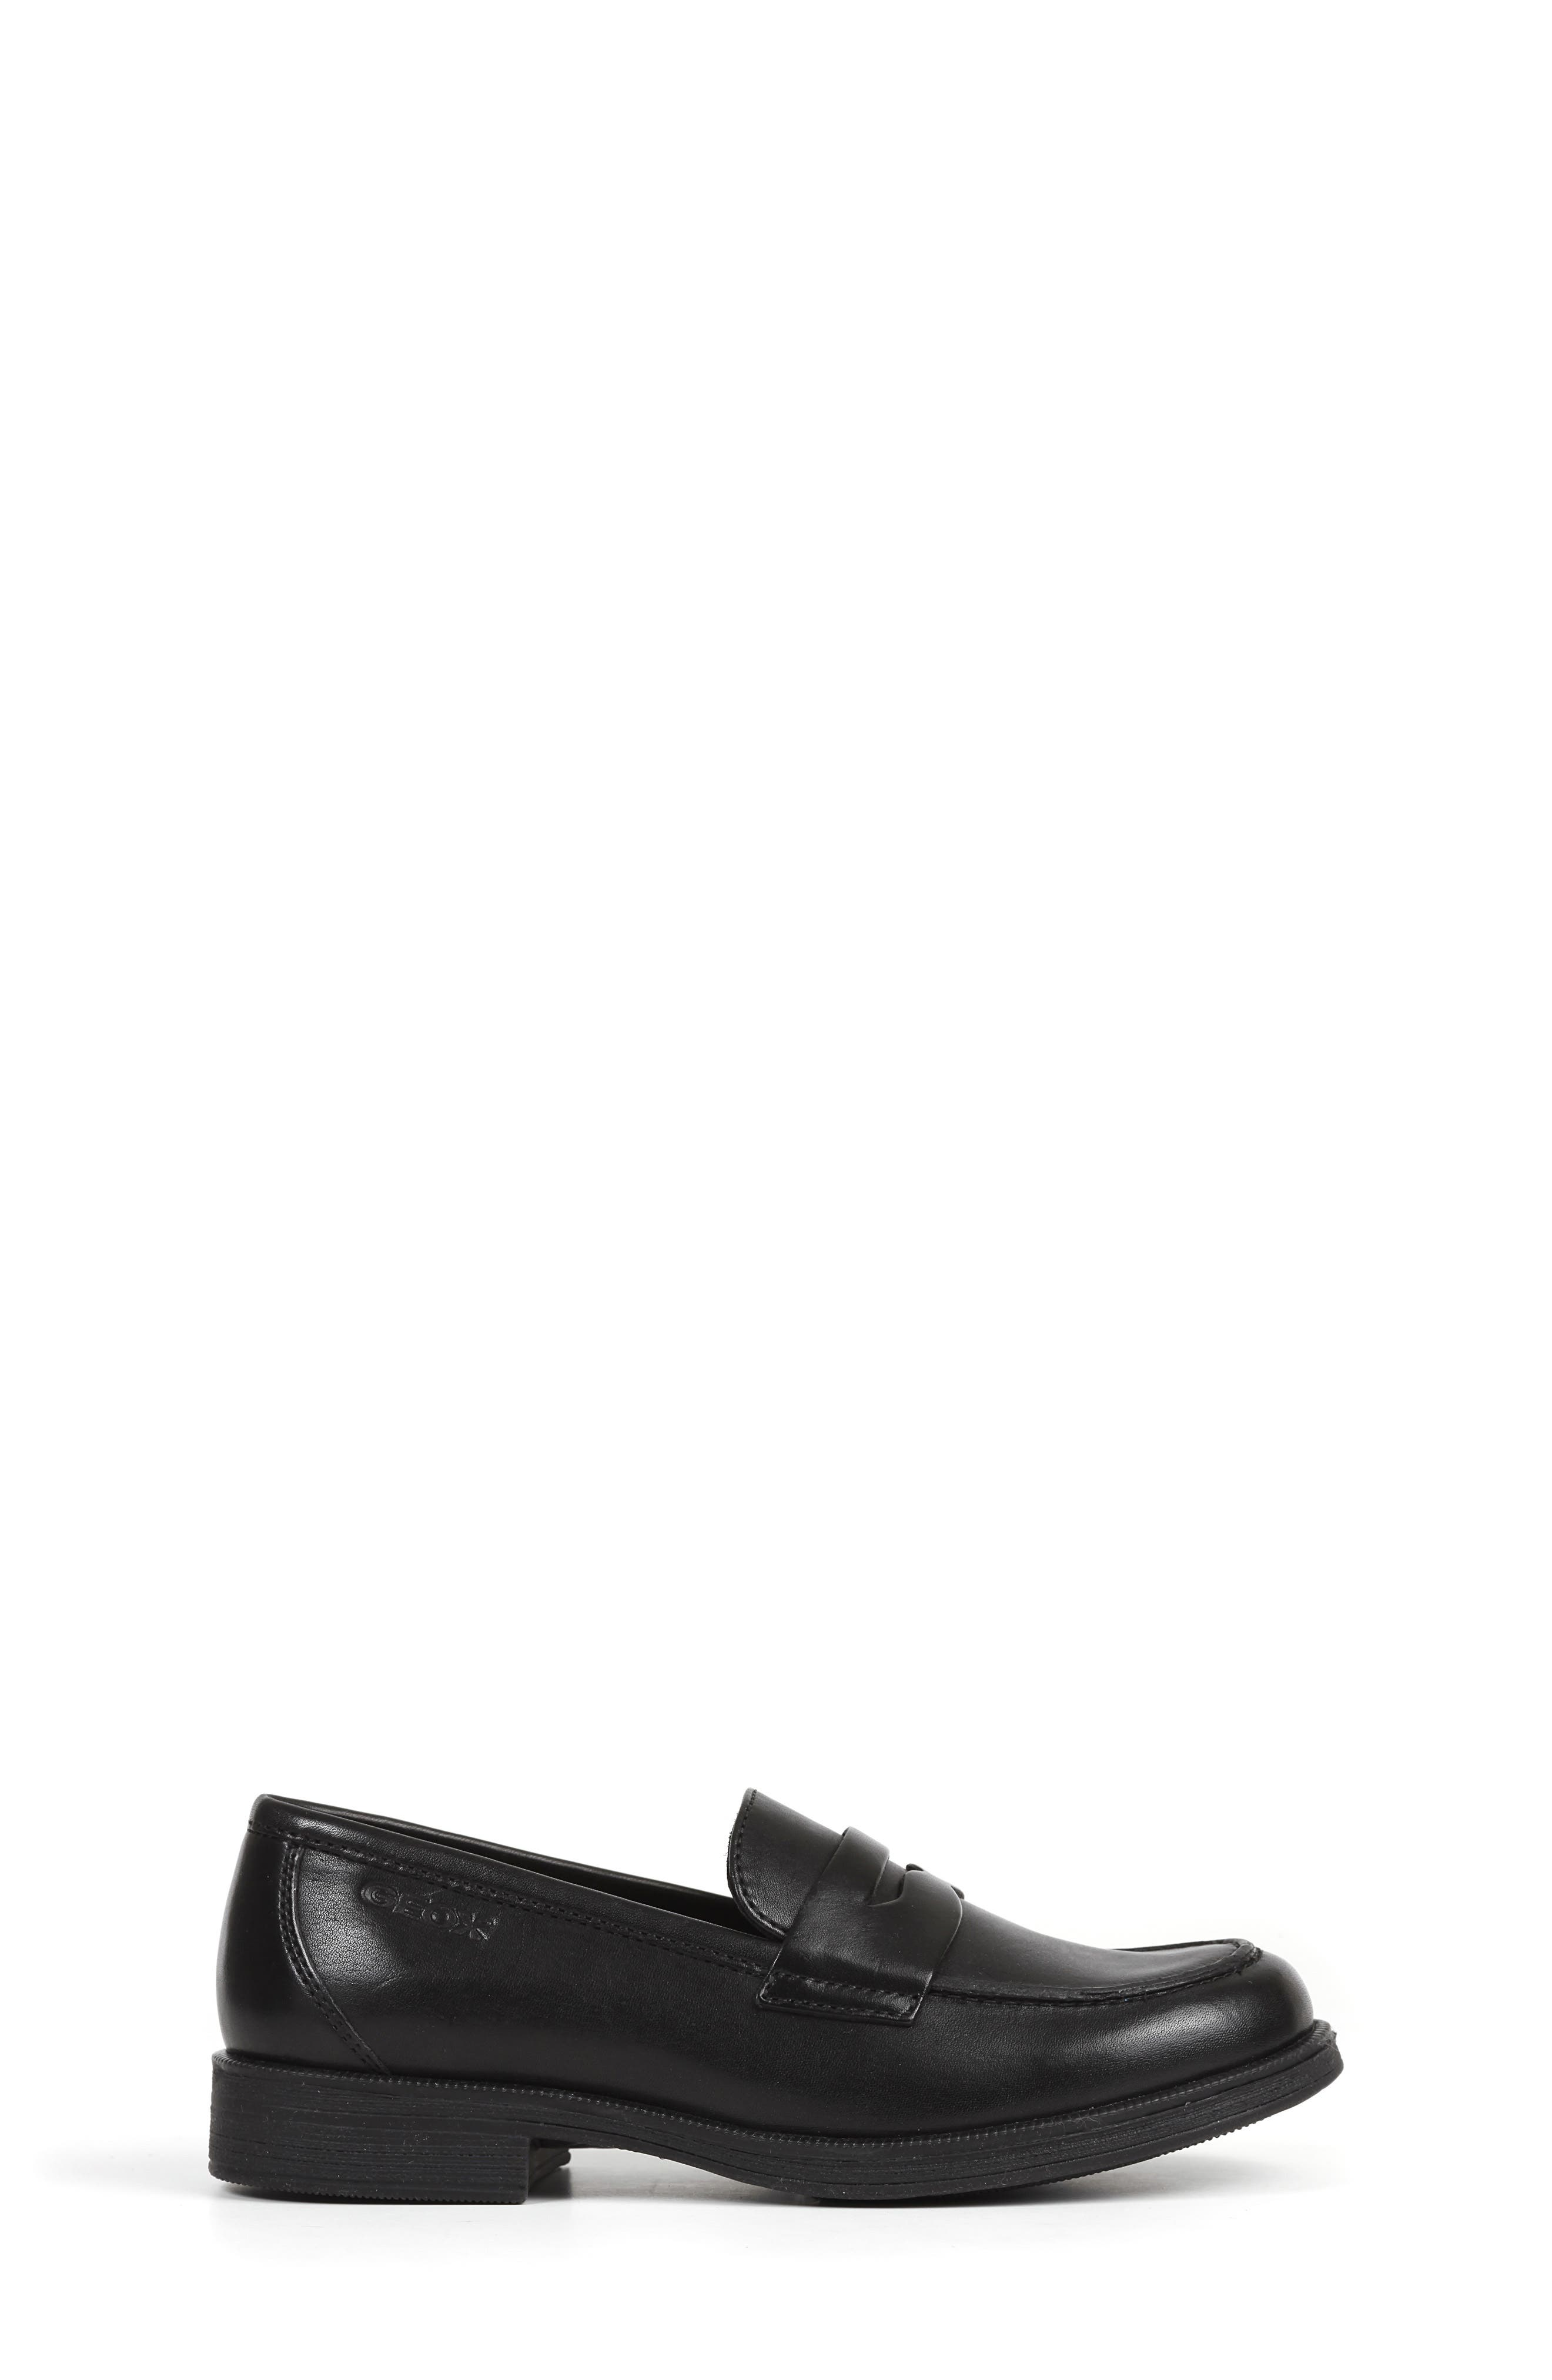 Agata 1 Penny Loafer,                             Alternate thumbnail 3, color,                             BLACK